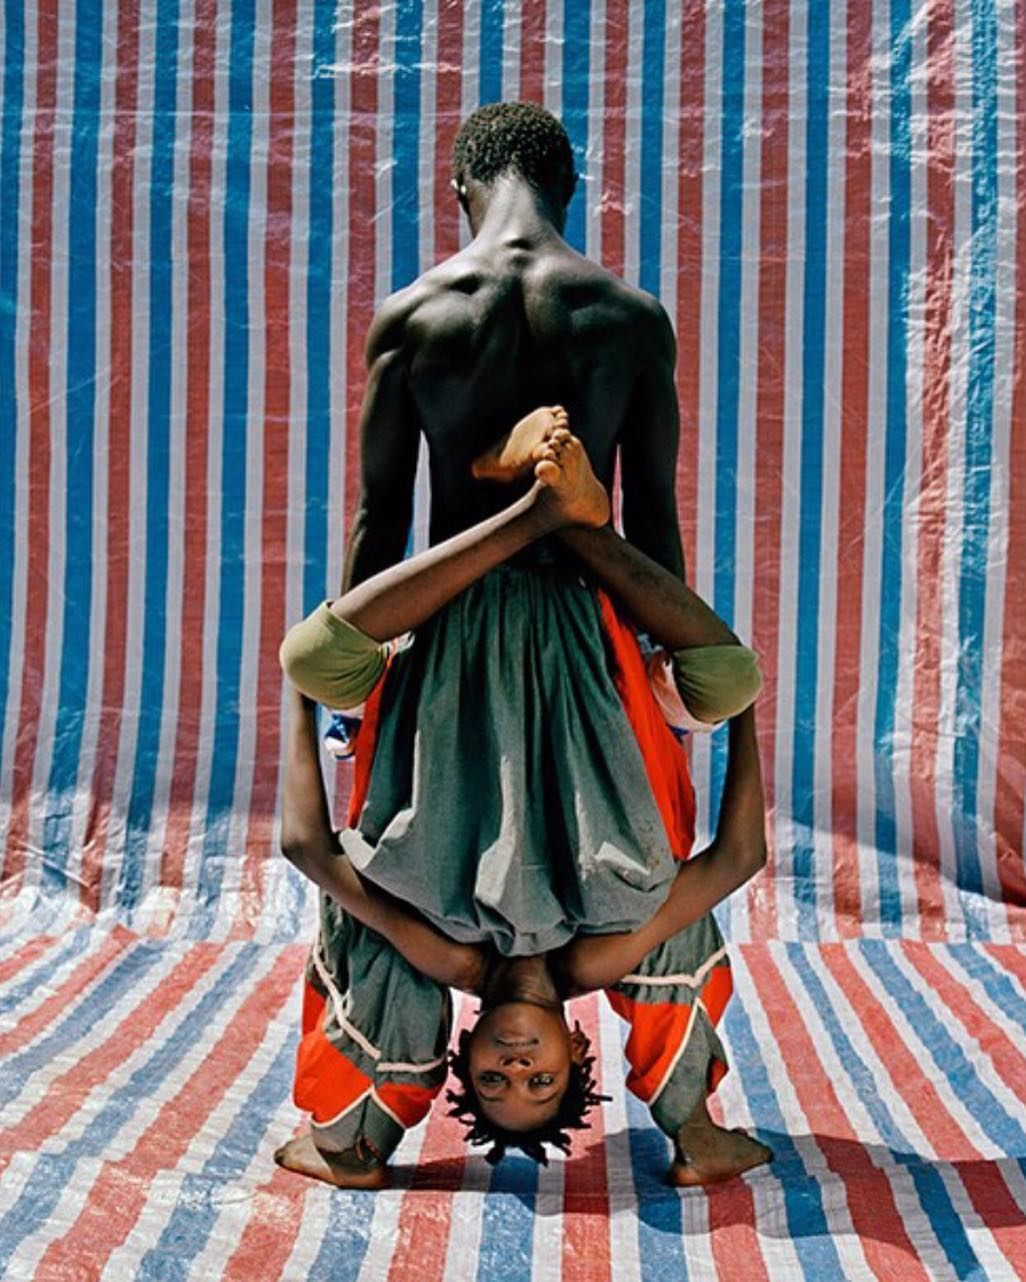 L I N K E D  :  @namsa ______ #Osengwa | #AfricanArt | #AfricanFashion | #AfricanMusic | #AfricanStyle | #AfricanPhotography | #Afrocentric | #Melanin | #African | #Art | #AfricanInspired | #InspiredByAfrica | #BlackIsBeautiful | #ContemporaryArt | #OutOfAfrica